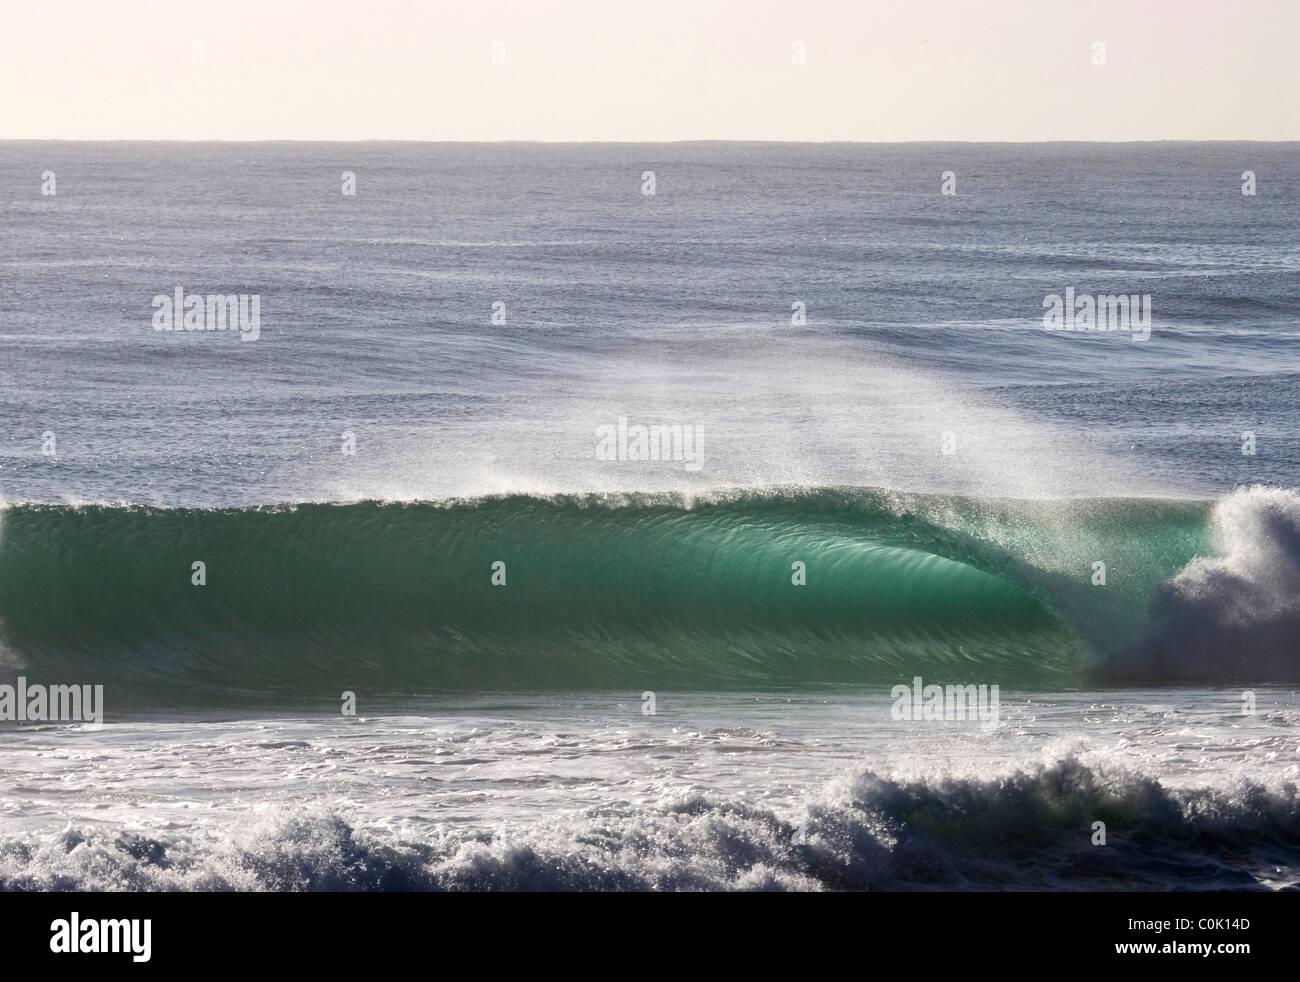 Breaking wave at Burleigh Heads Gold Coast Australia - Stock Image